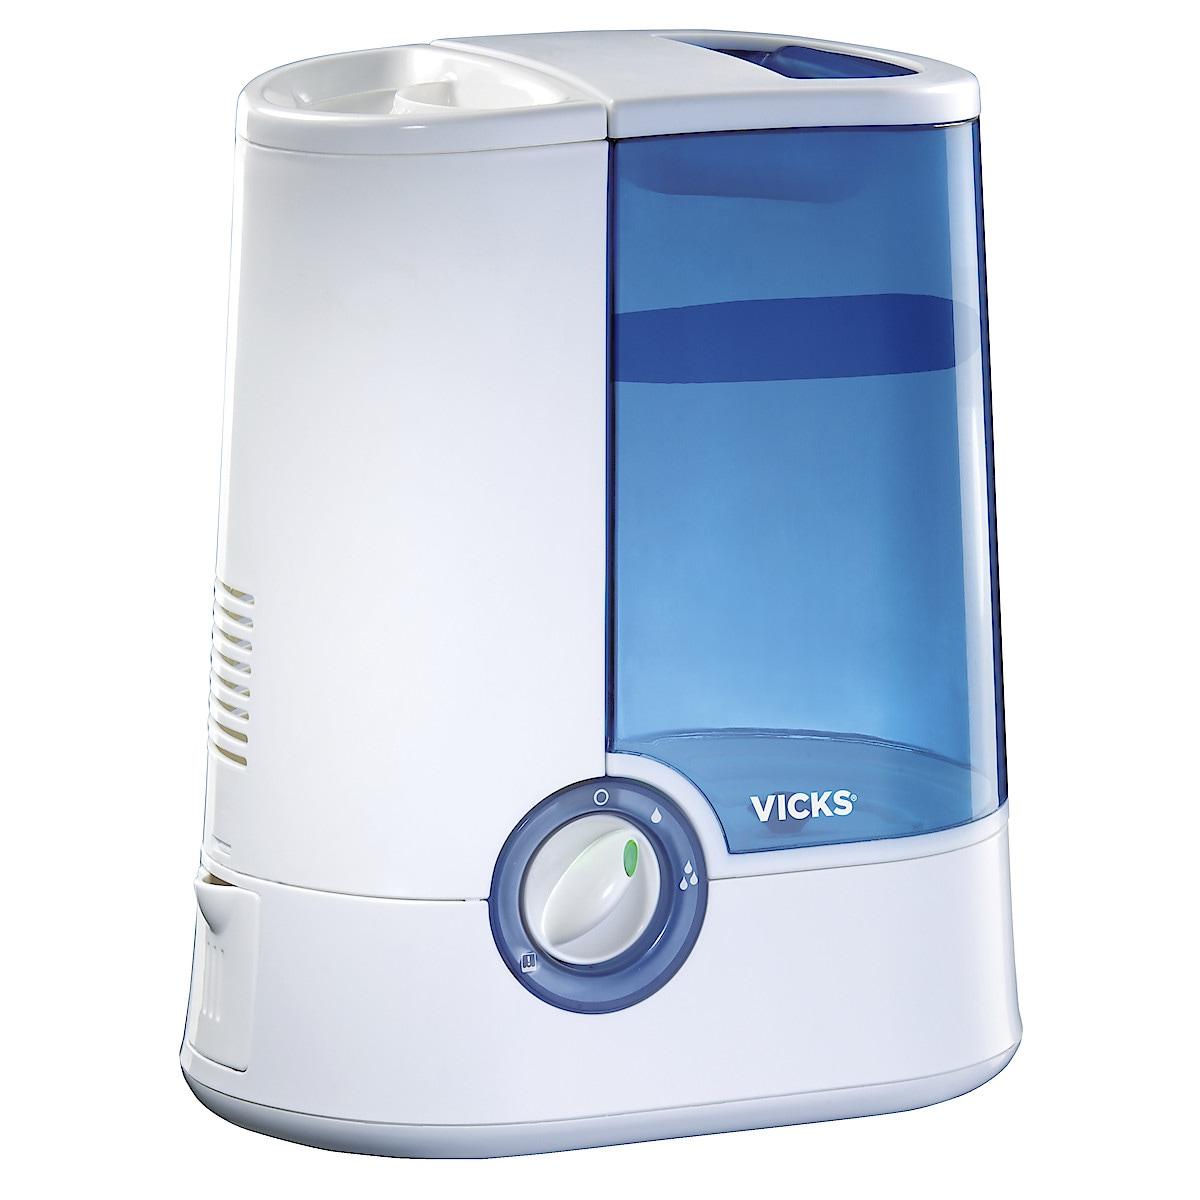 Vicks VH750UK Warm Mist Humidifier